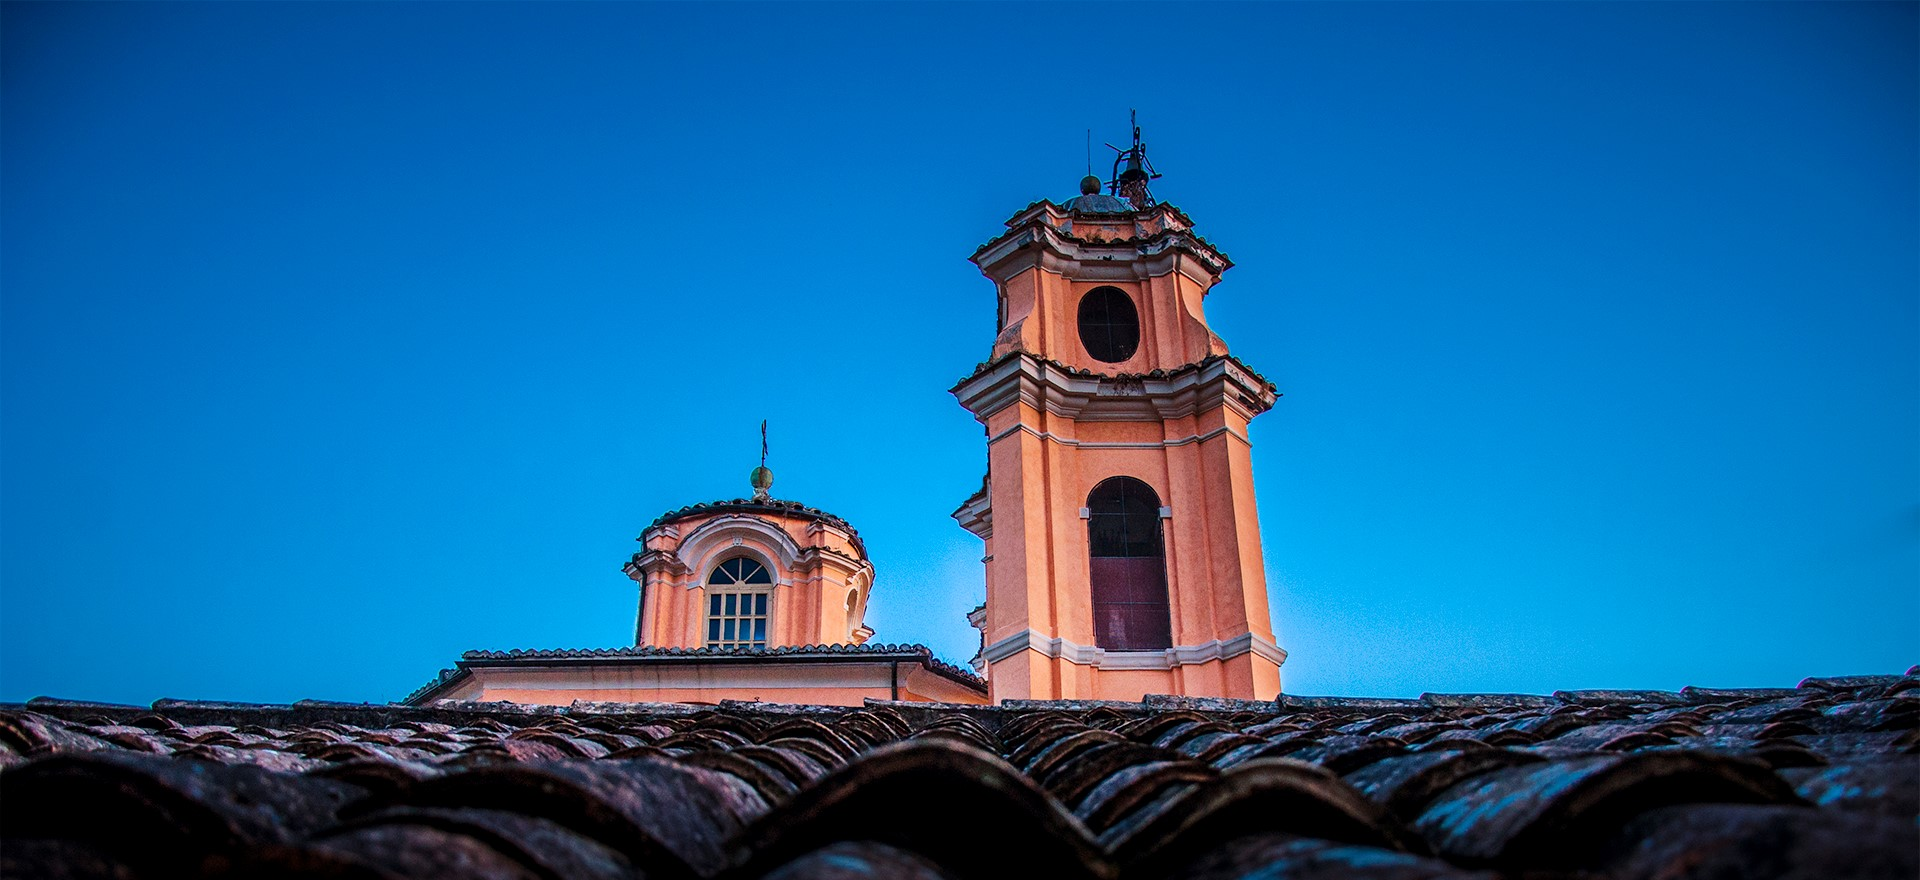 Marco-Schirinzi-San-Lorenzo-Foto-011